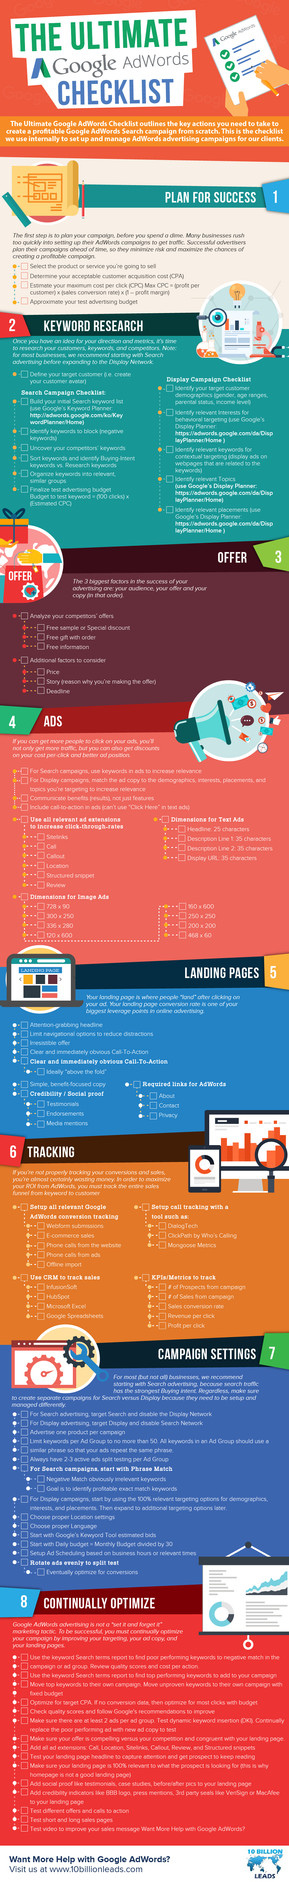 The Ultimate Google AdWords Checklist